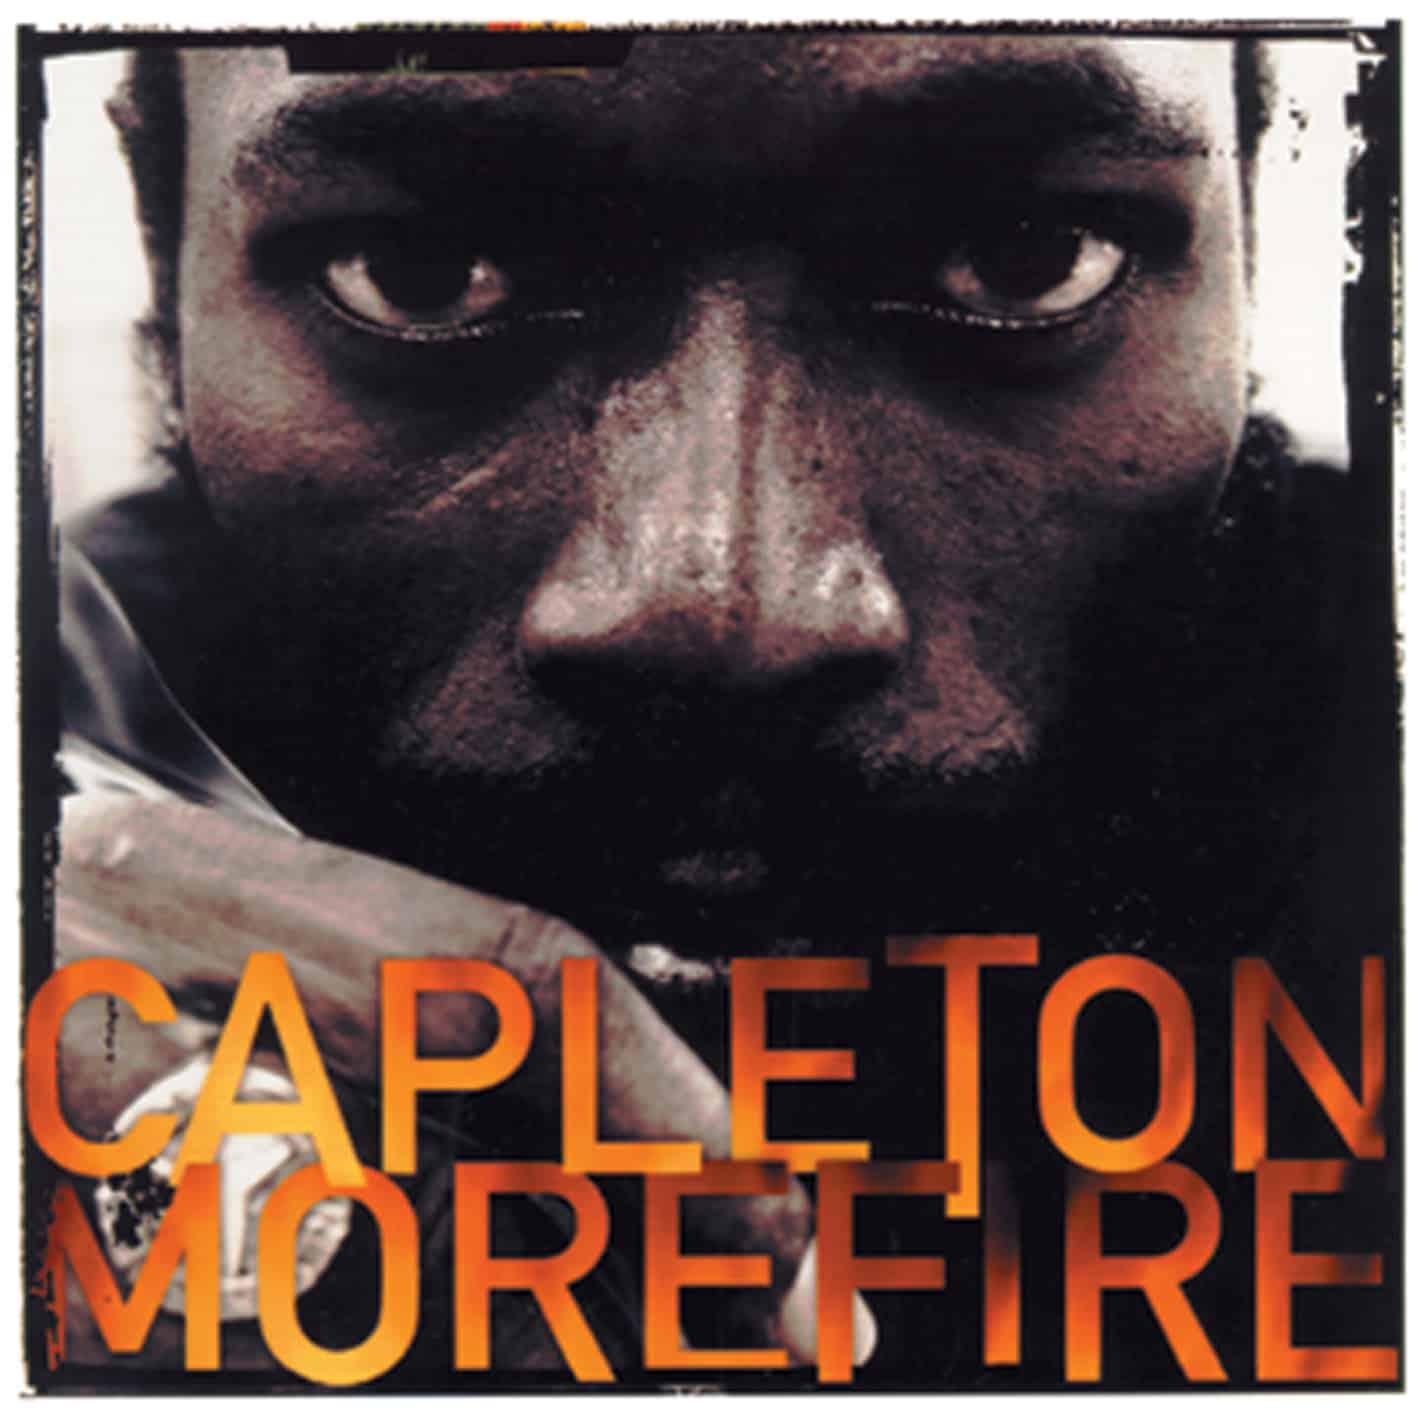 image-classique-capleton-more-fire